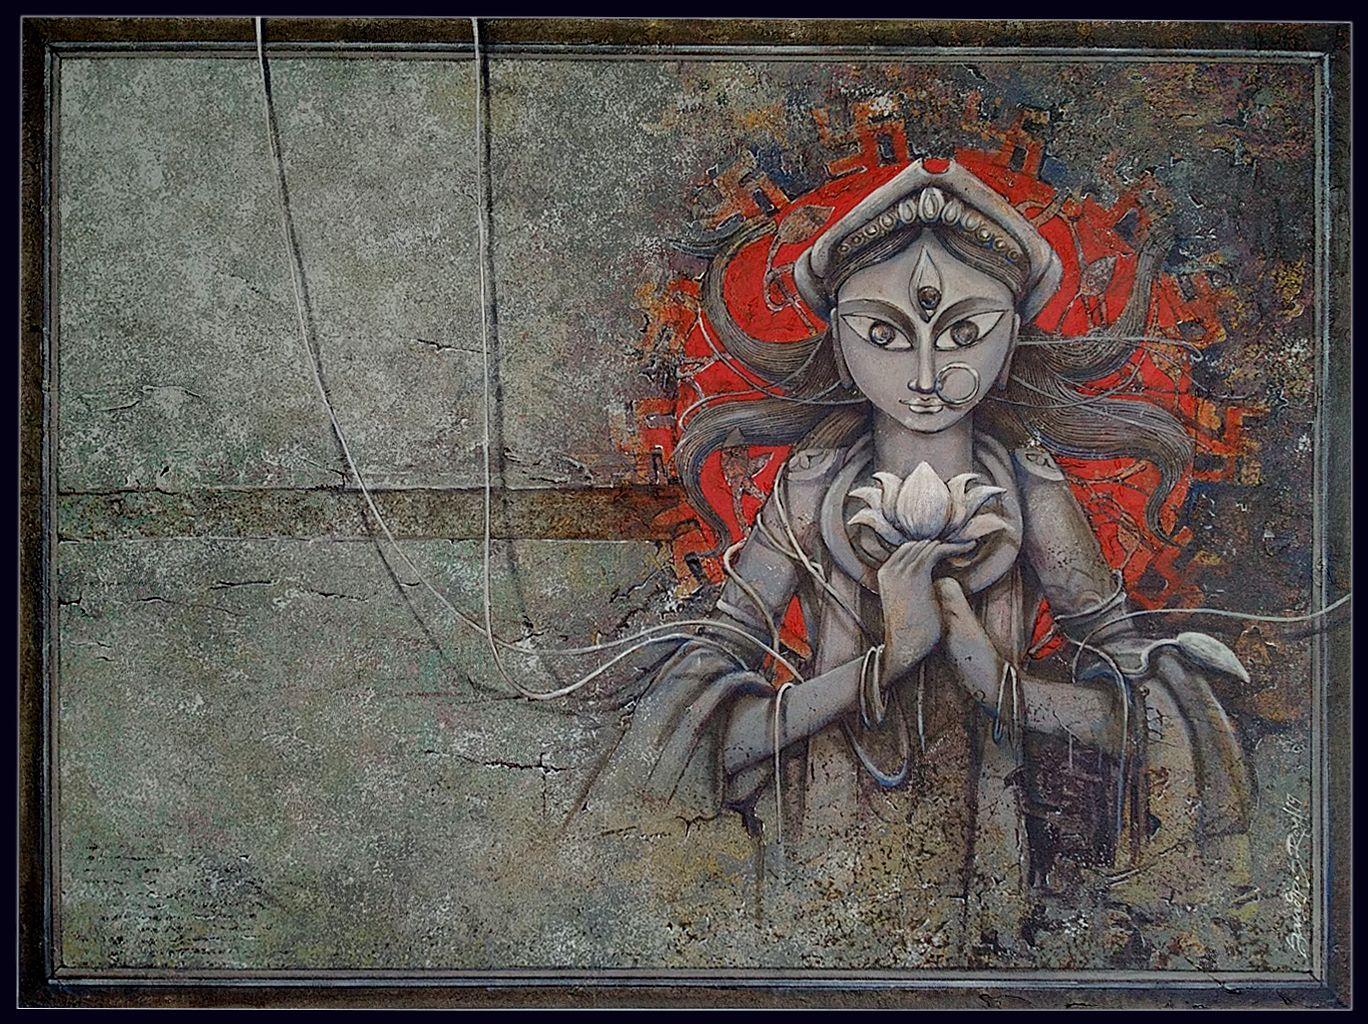 Maa Durga in 2020 Indian art paintings, Indian art